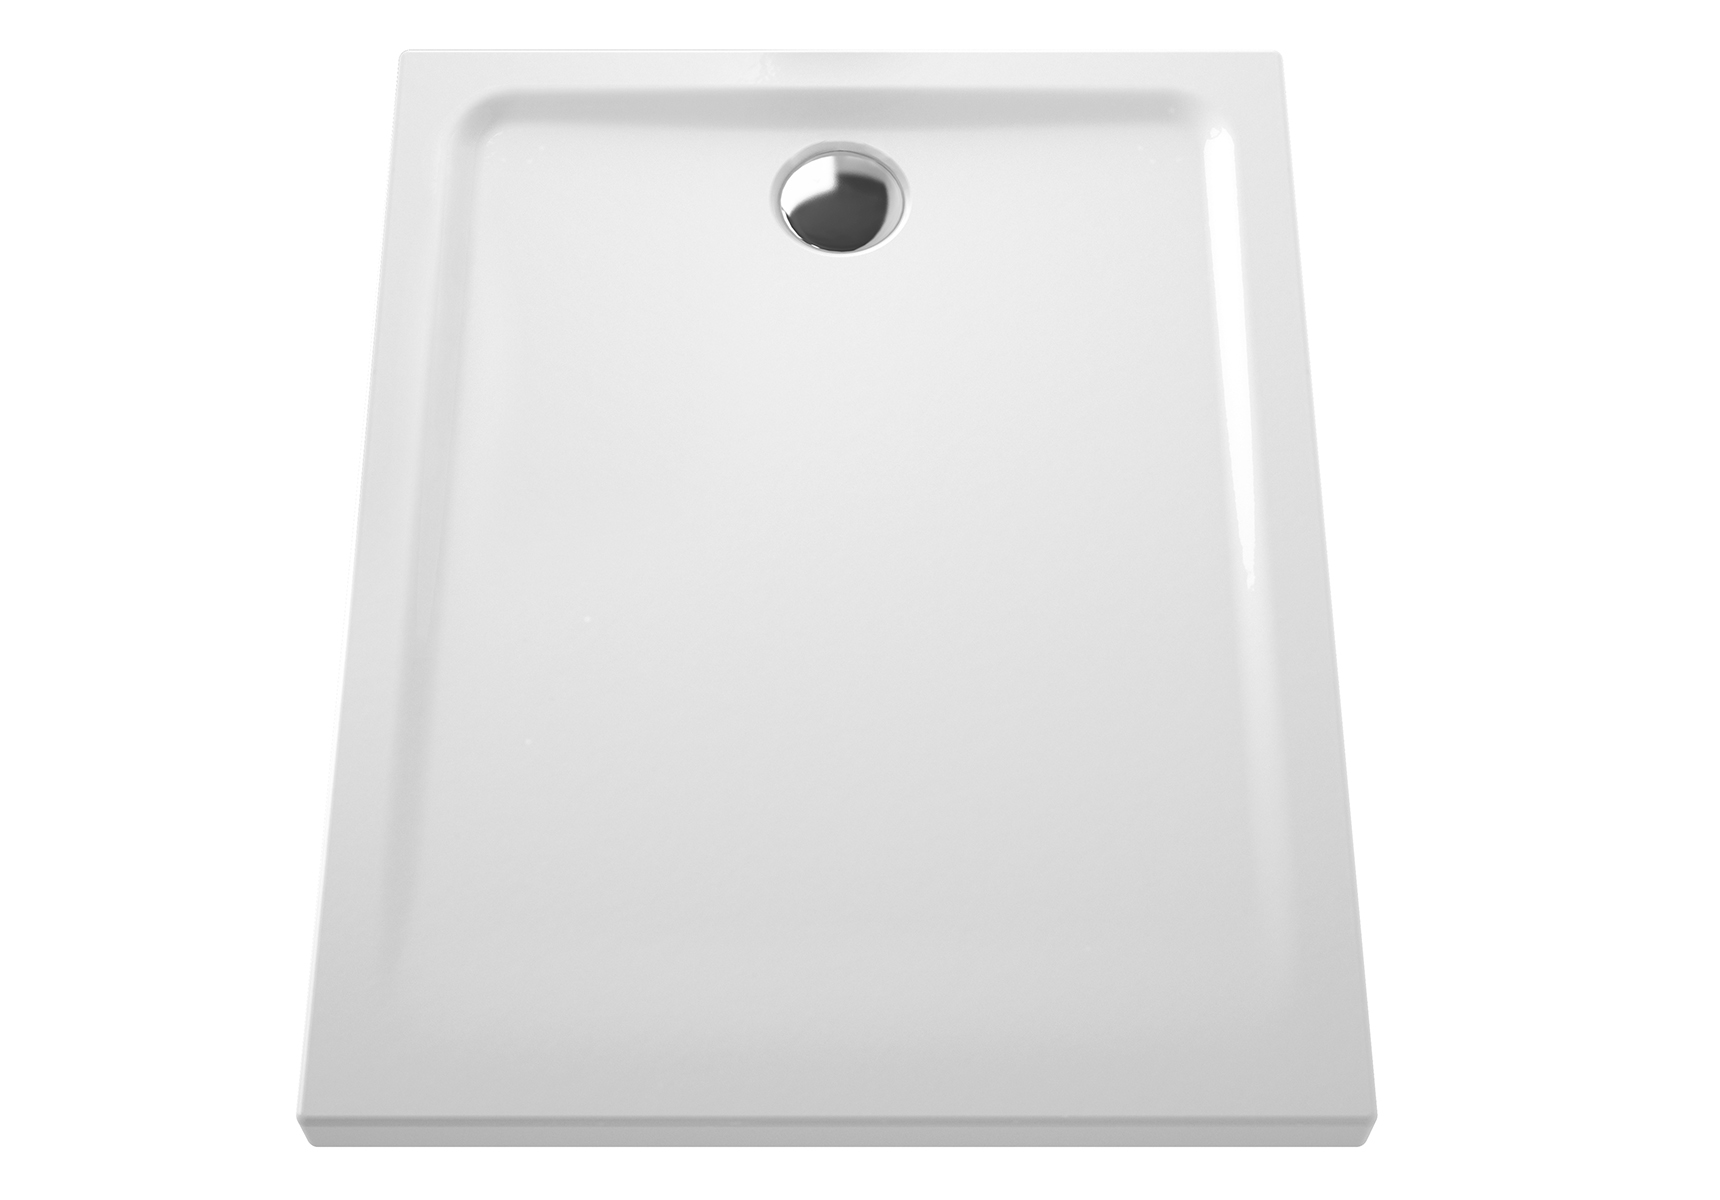 Arkitekt receveur à encastrer ou à poser extra plat, 100  x  80 cm